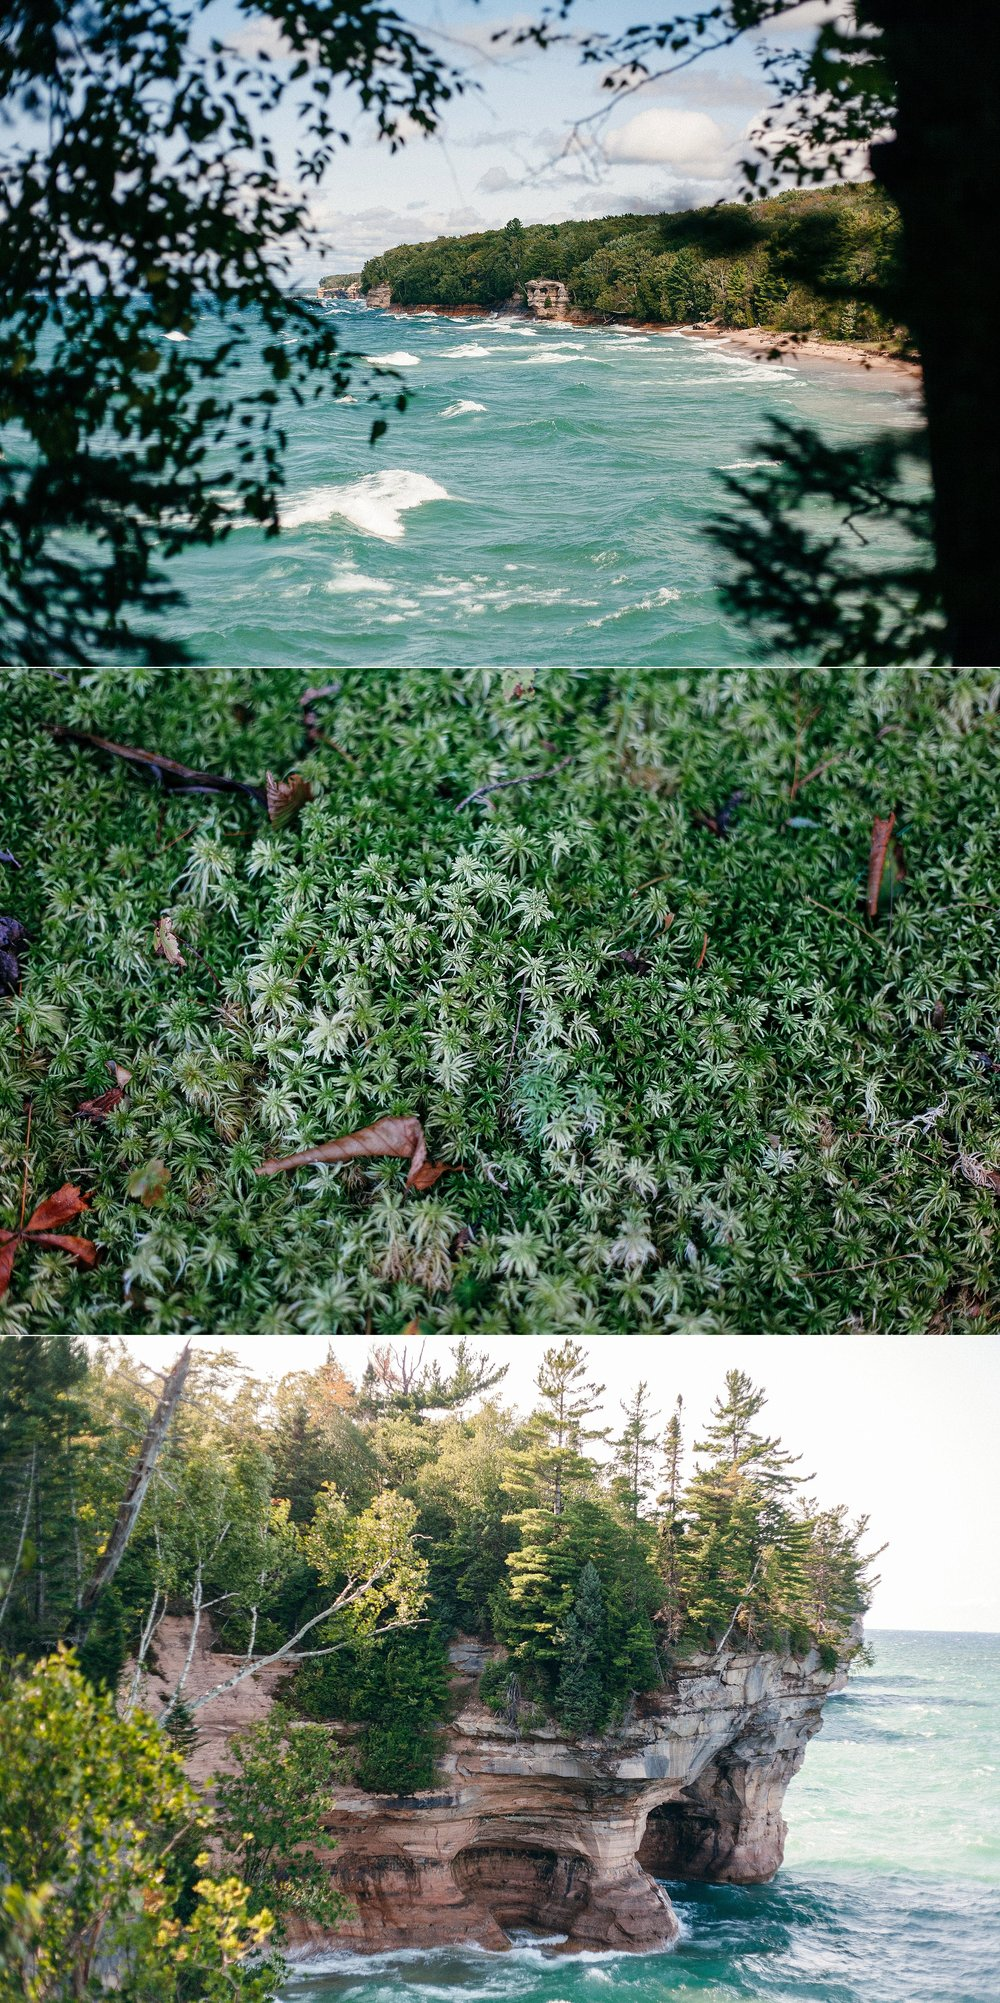 backpacking-michigan-upper-peninsula-pictured-rocks-camping-lake-superior_0048.jpg